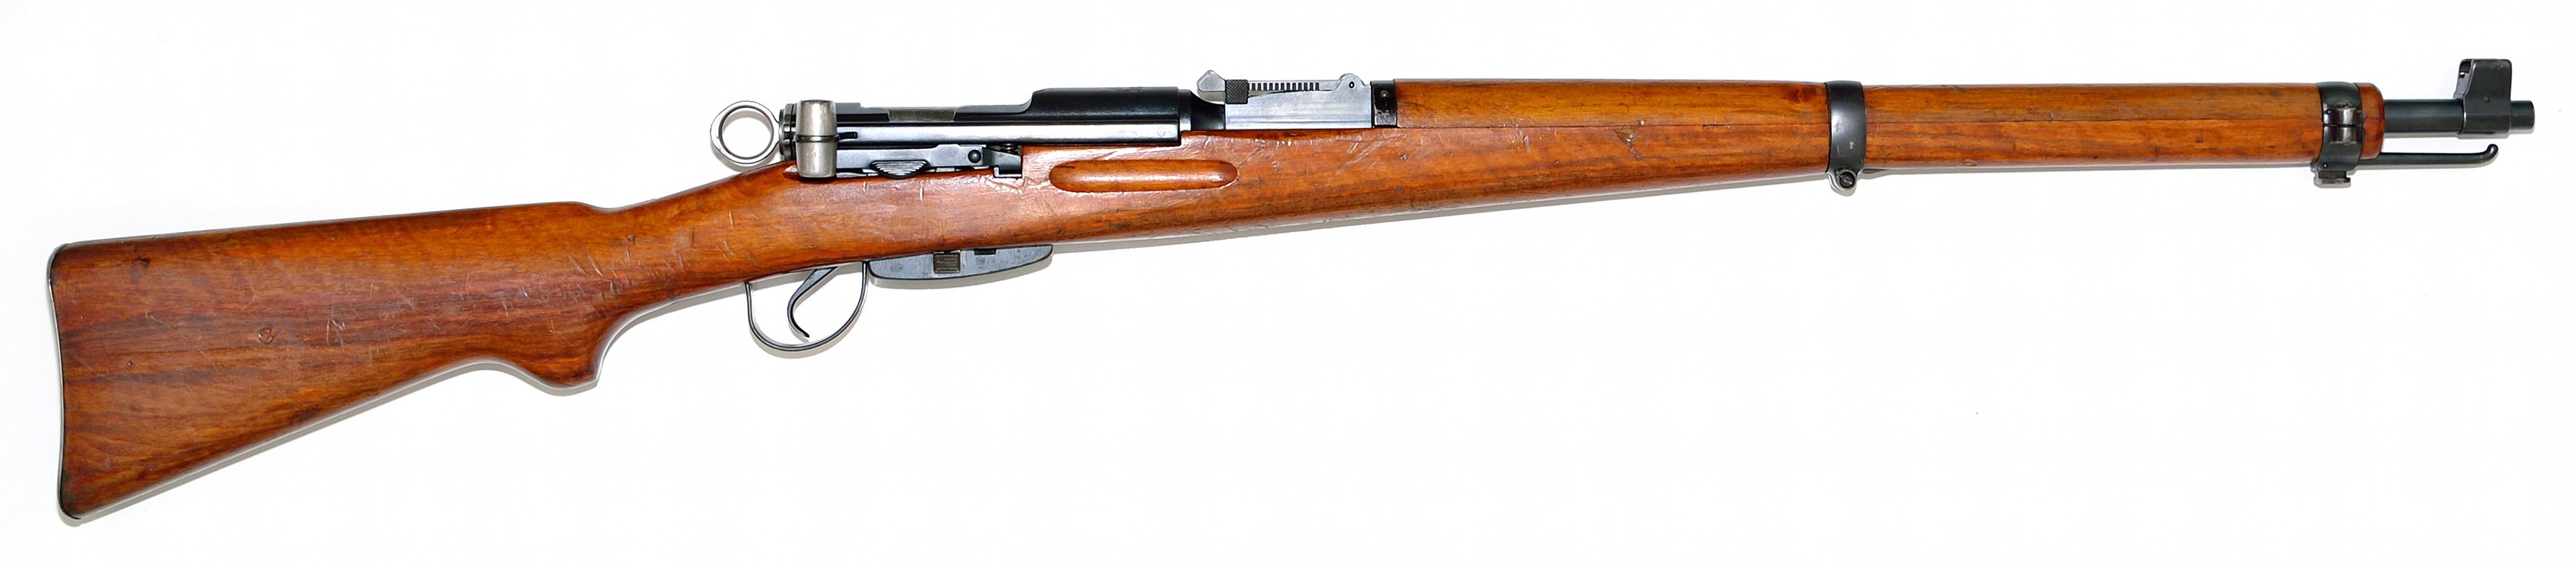 Karabiner Model 1931 (K31)